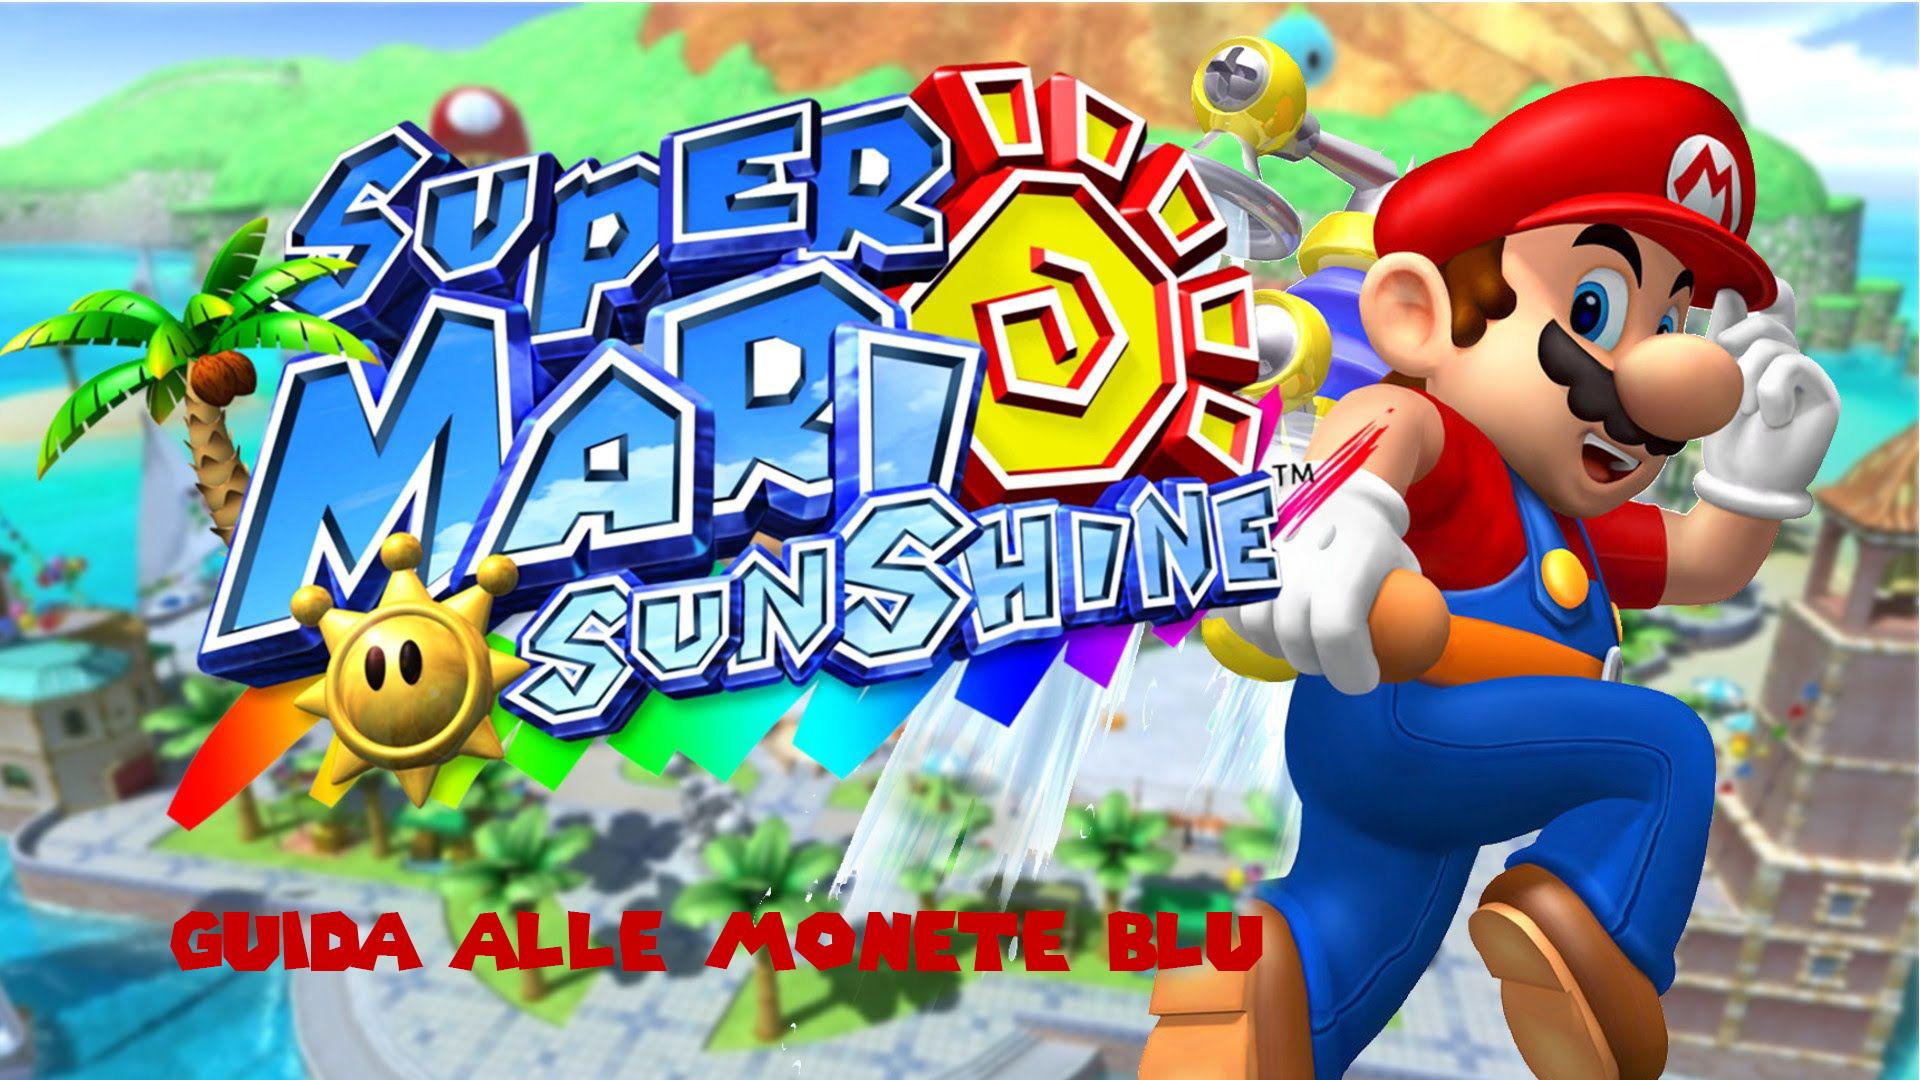 Super-Mario-Sunshine-Guida-Monete-Blu-Switch-NintendOn